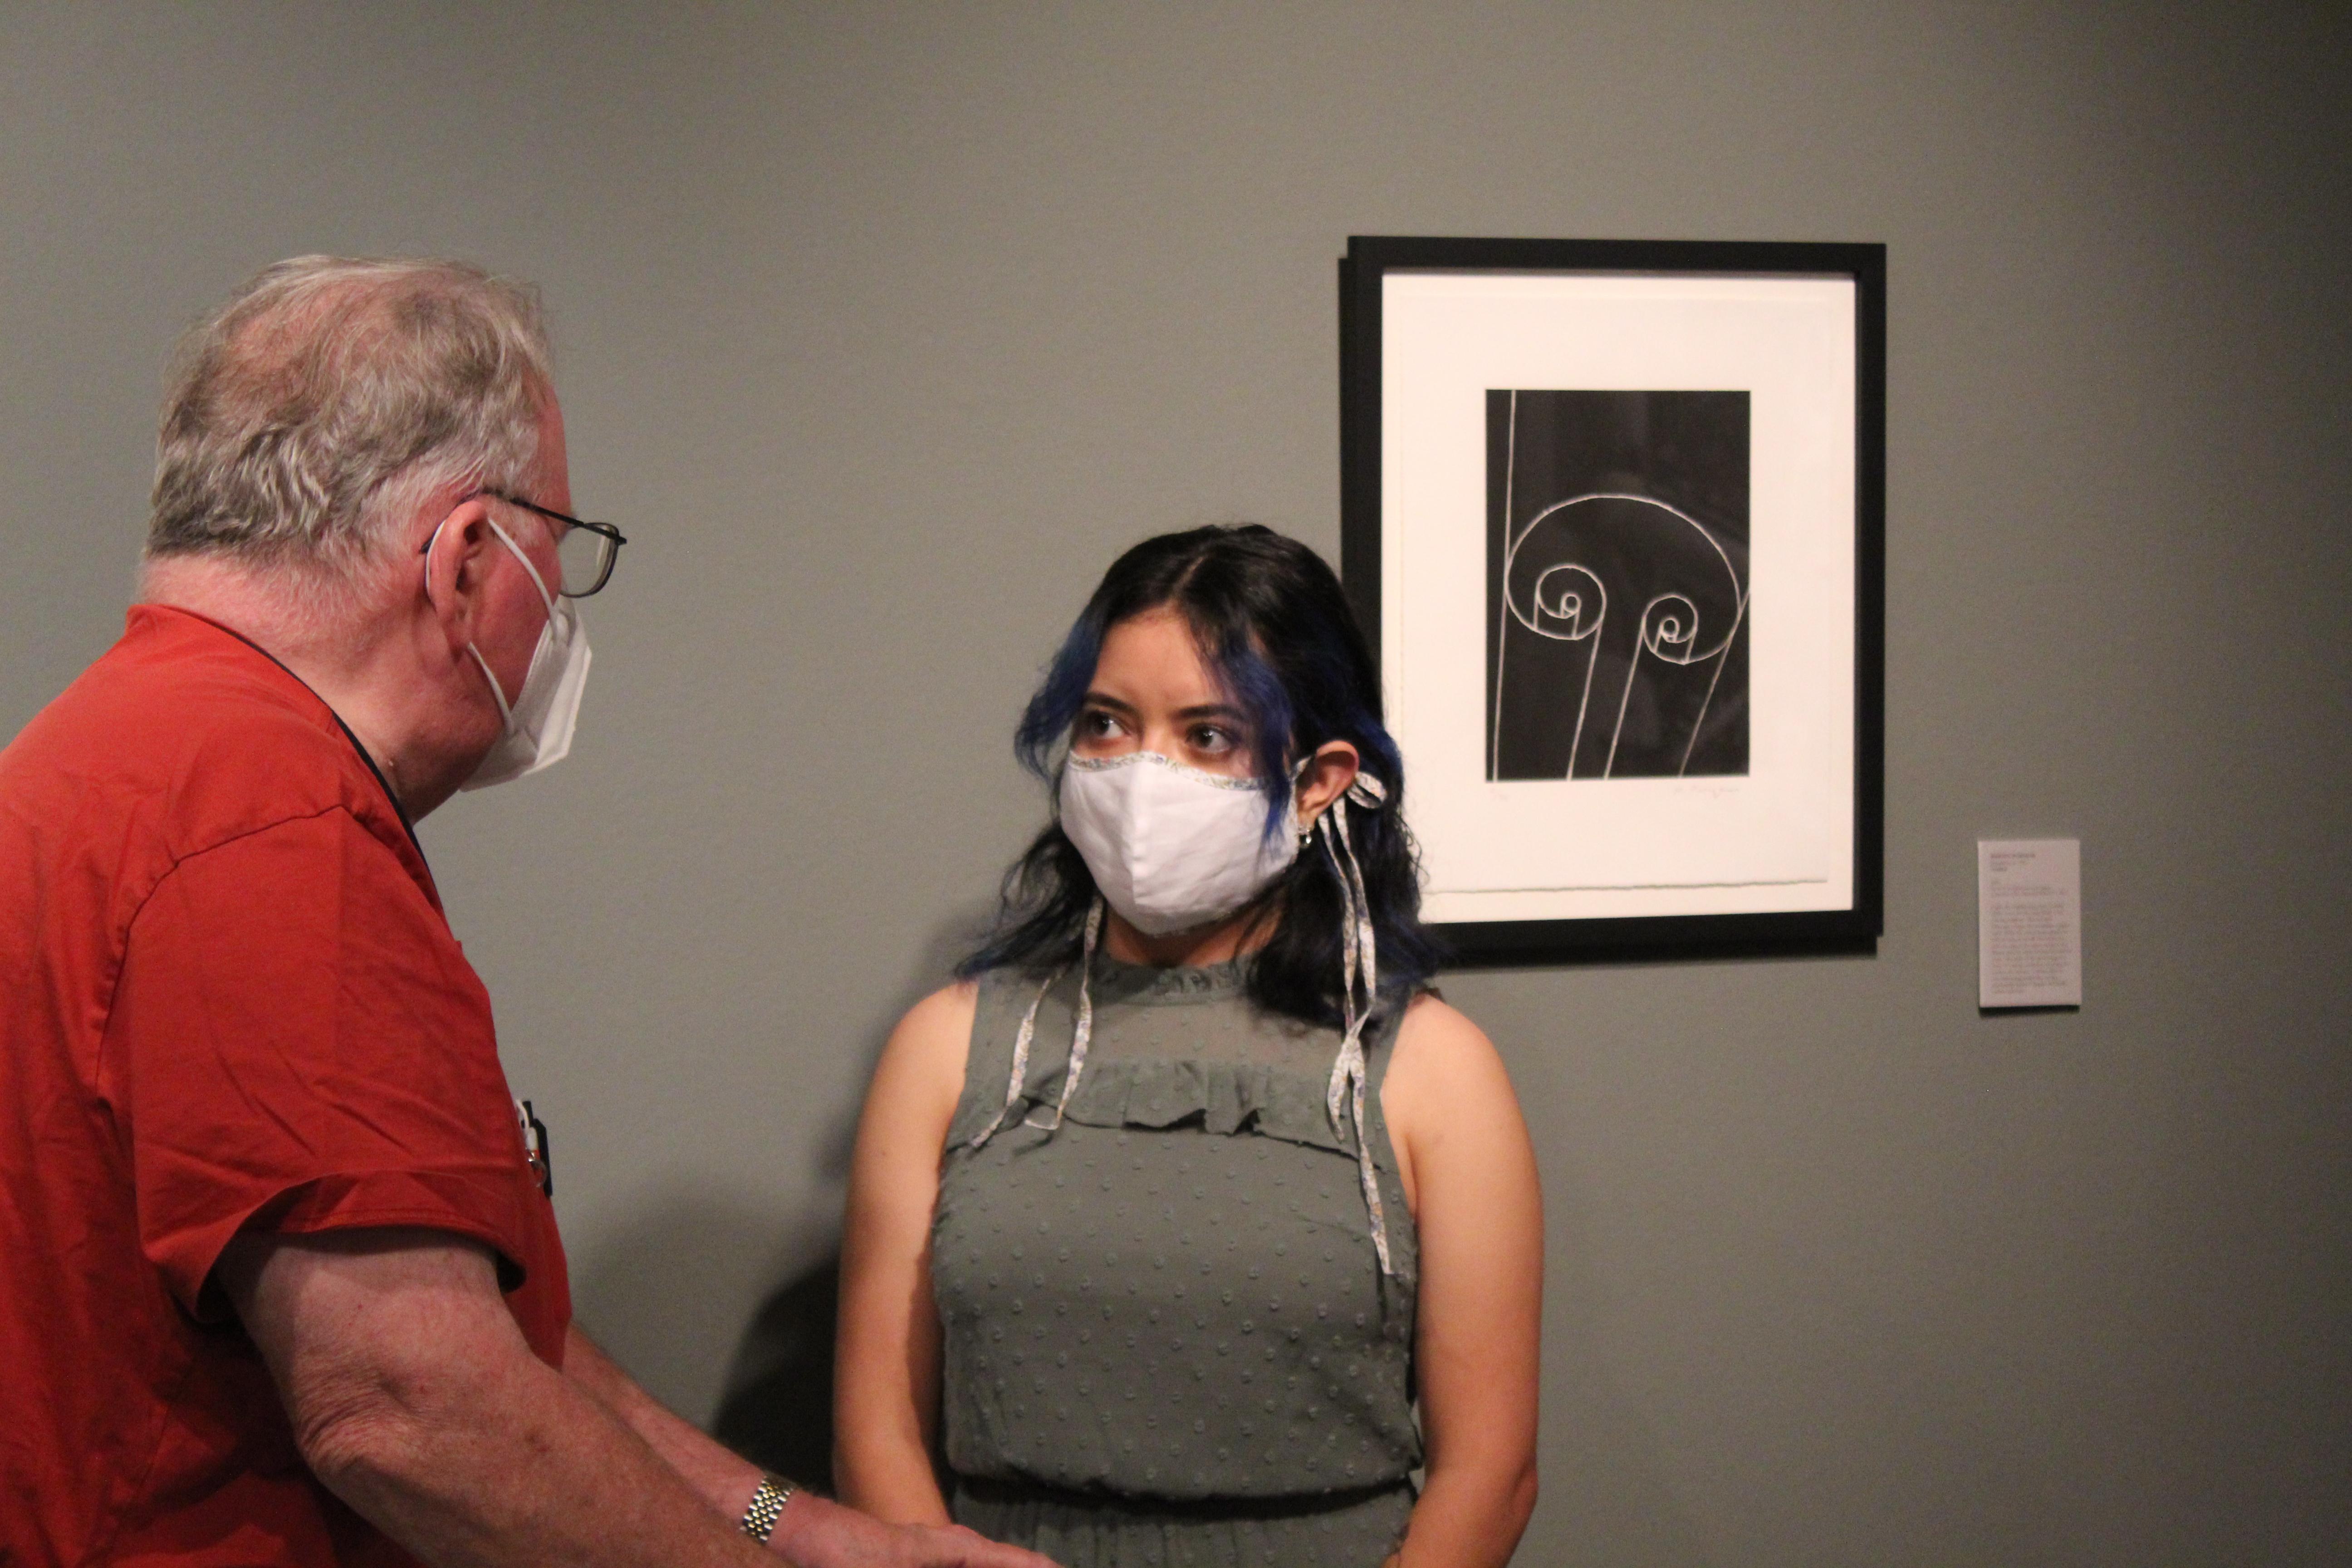 Merlyn Maldonado Lopez '21 discussing the exhibit at the Schmucker Art Gallery (Photo Maggie Galloway/The Gettysburgian)